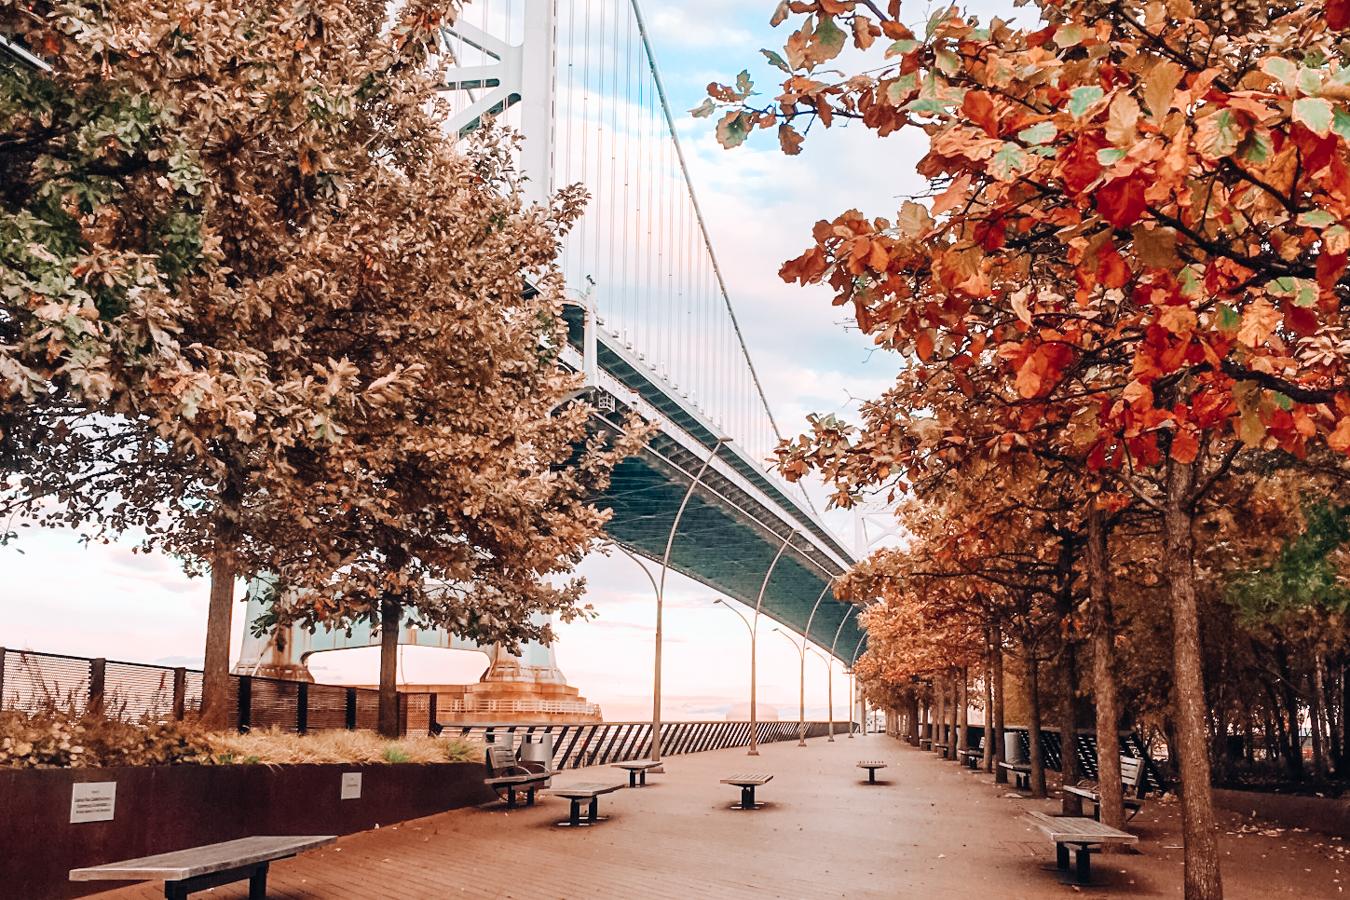 Bridge and nature in Philadelphia